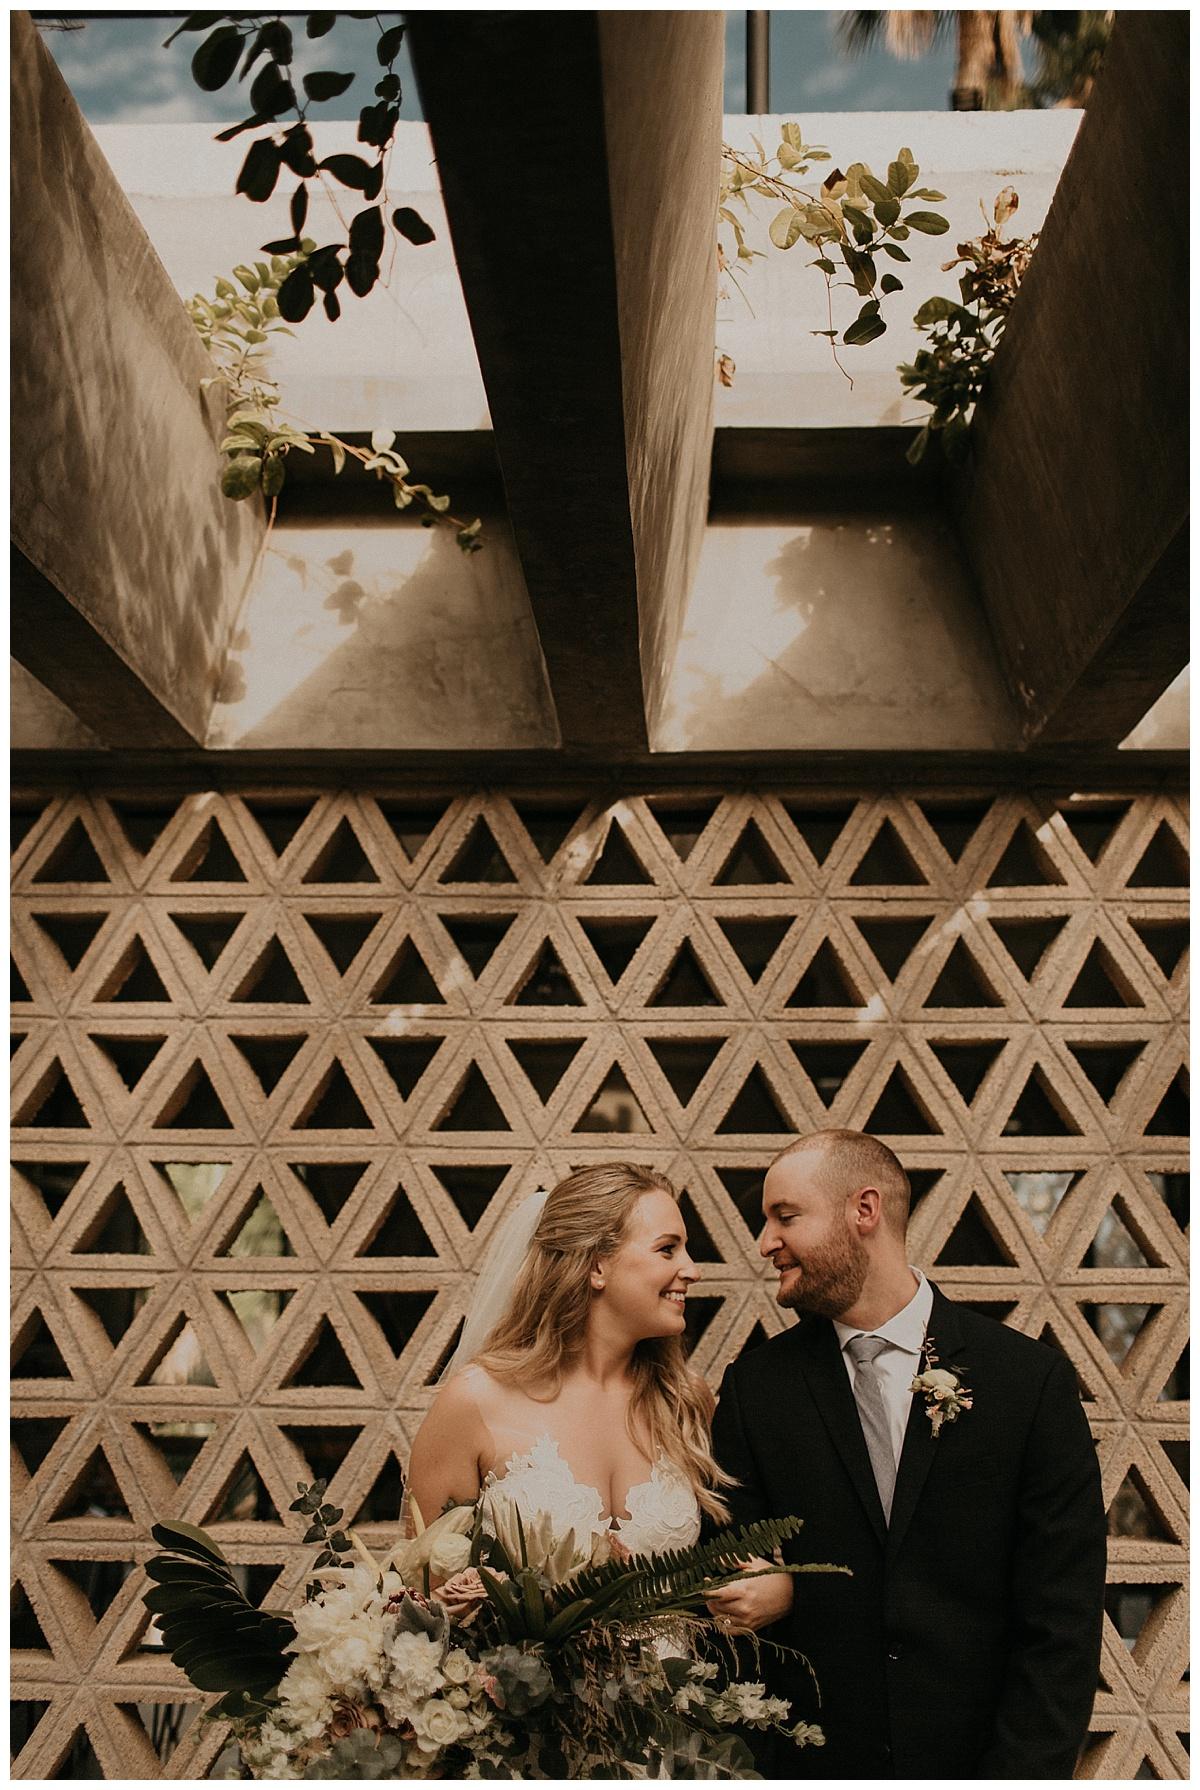 Bixby+Pine-PNW-Wedding-Planners-And-Designers_1777.jpg